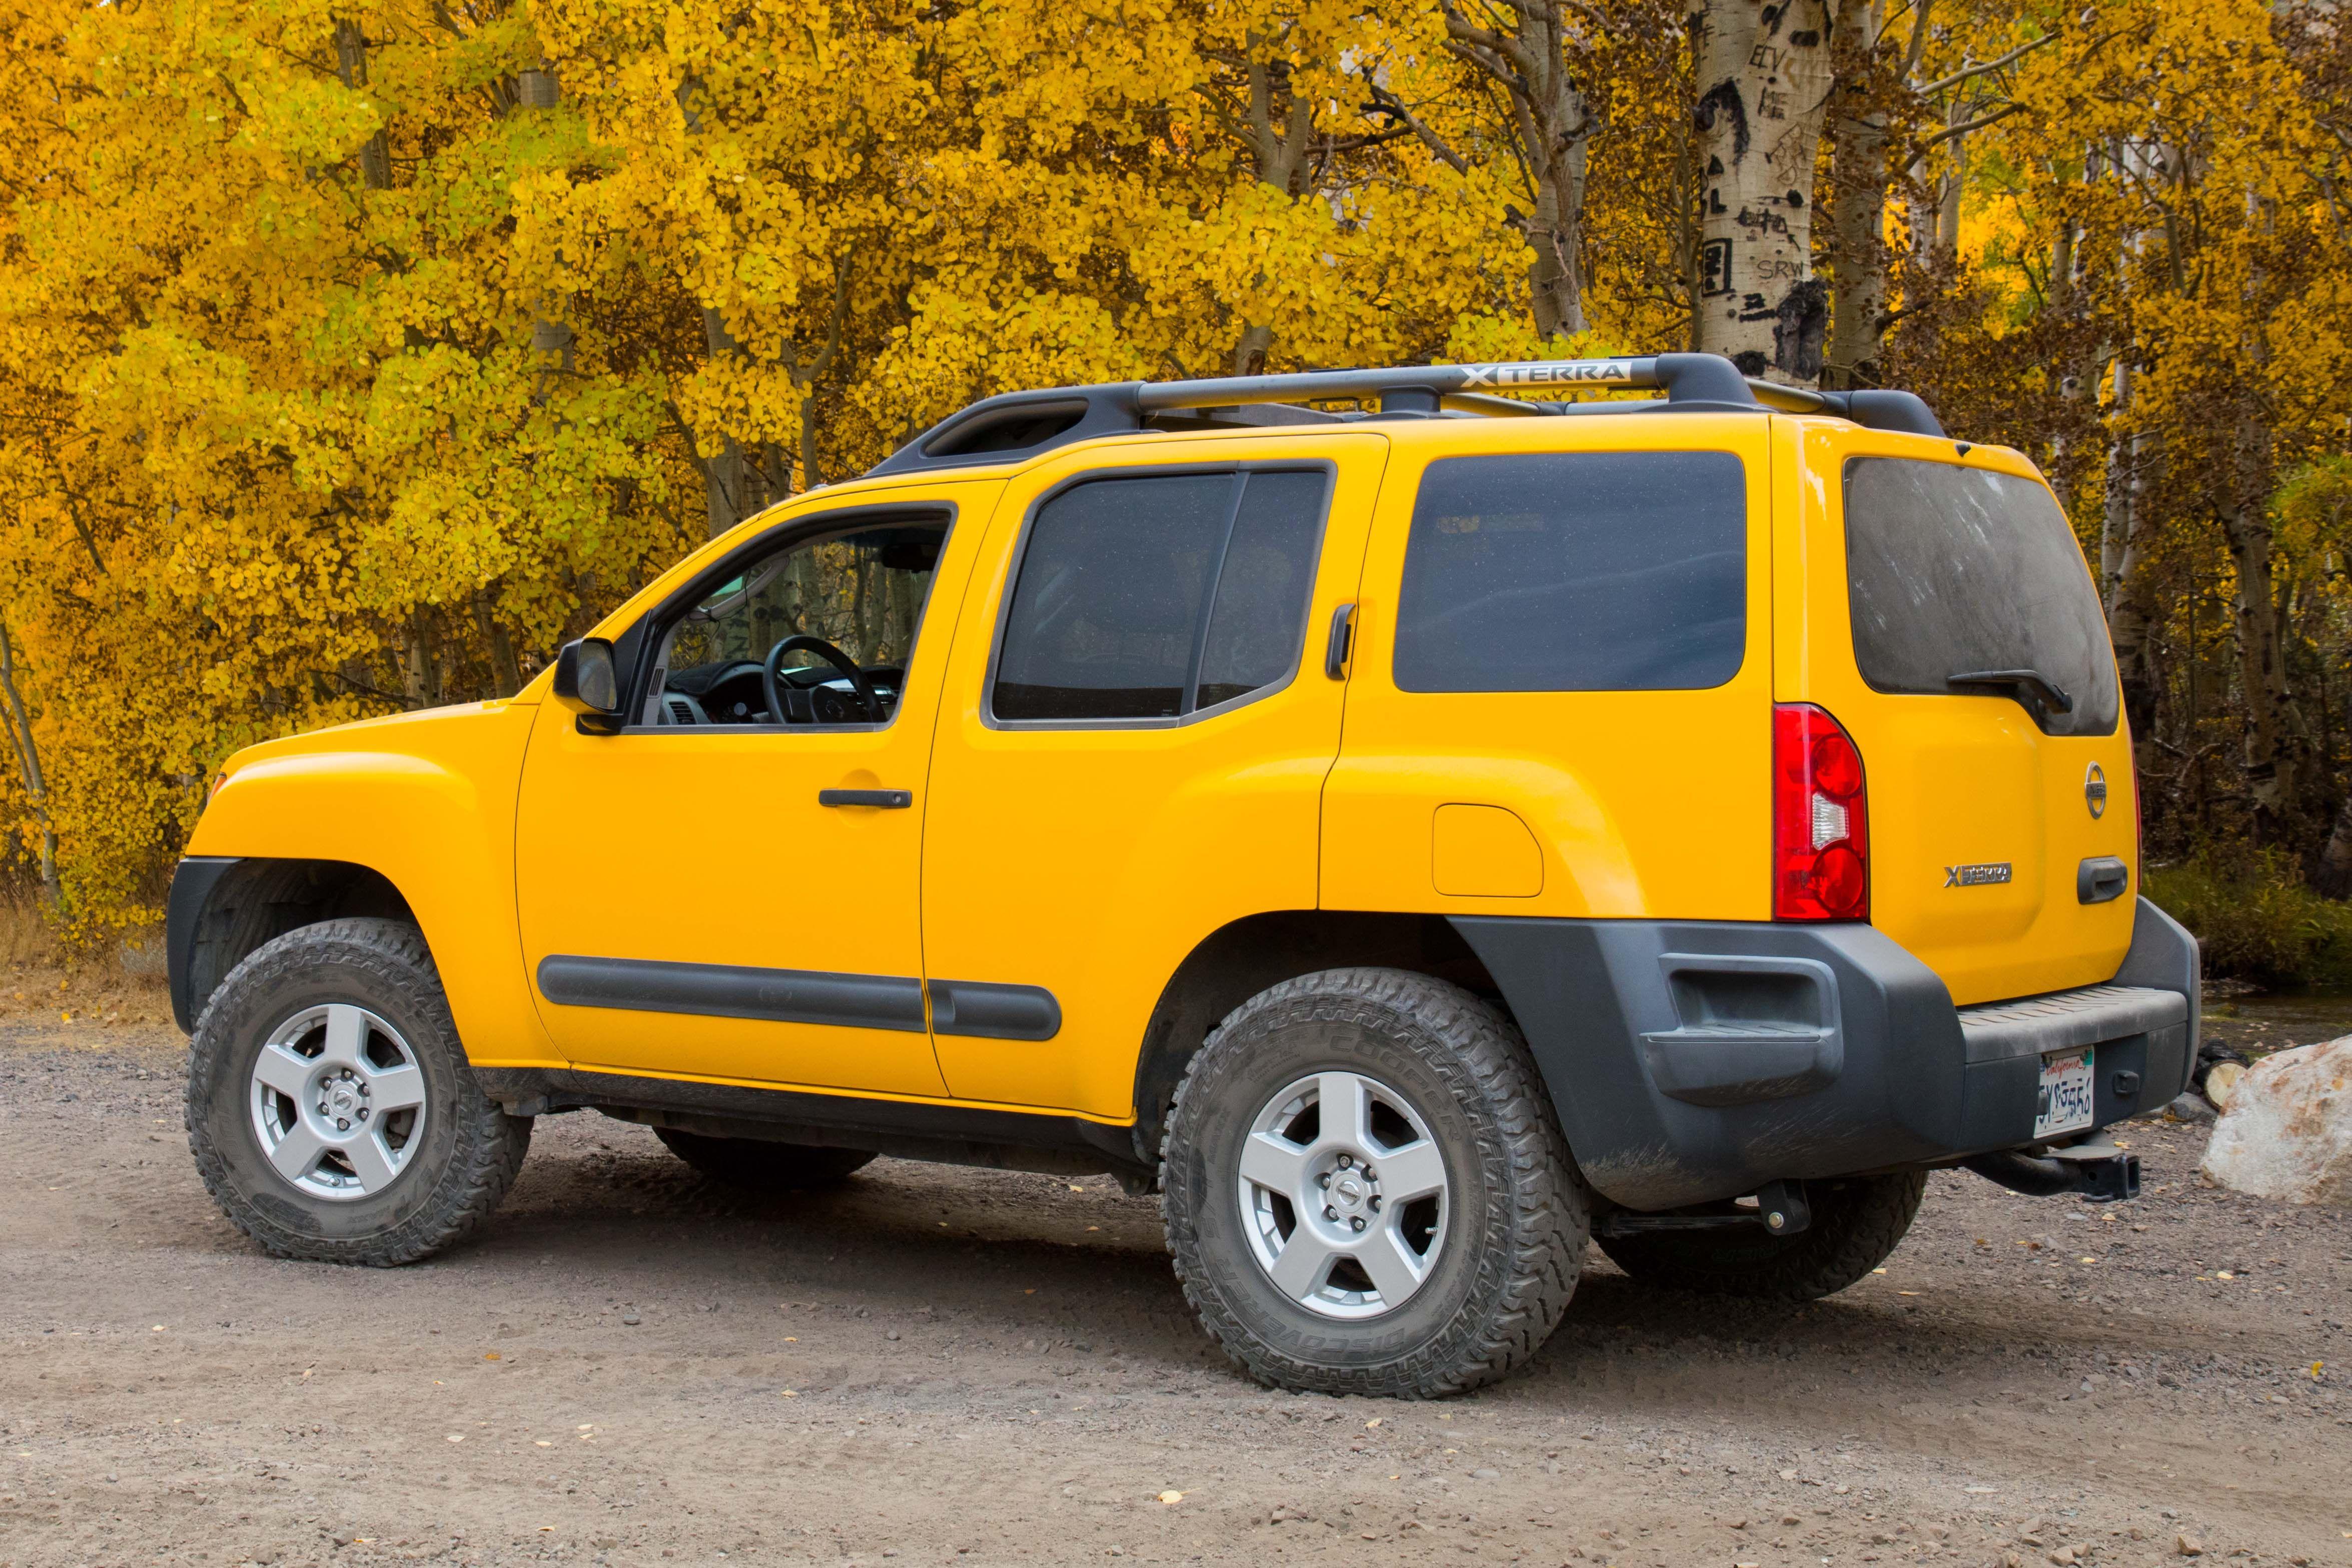 Yellow 2006 Nissan Xterra Cooper ST Maxx Tires at 15 psi near Laurel